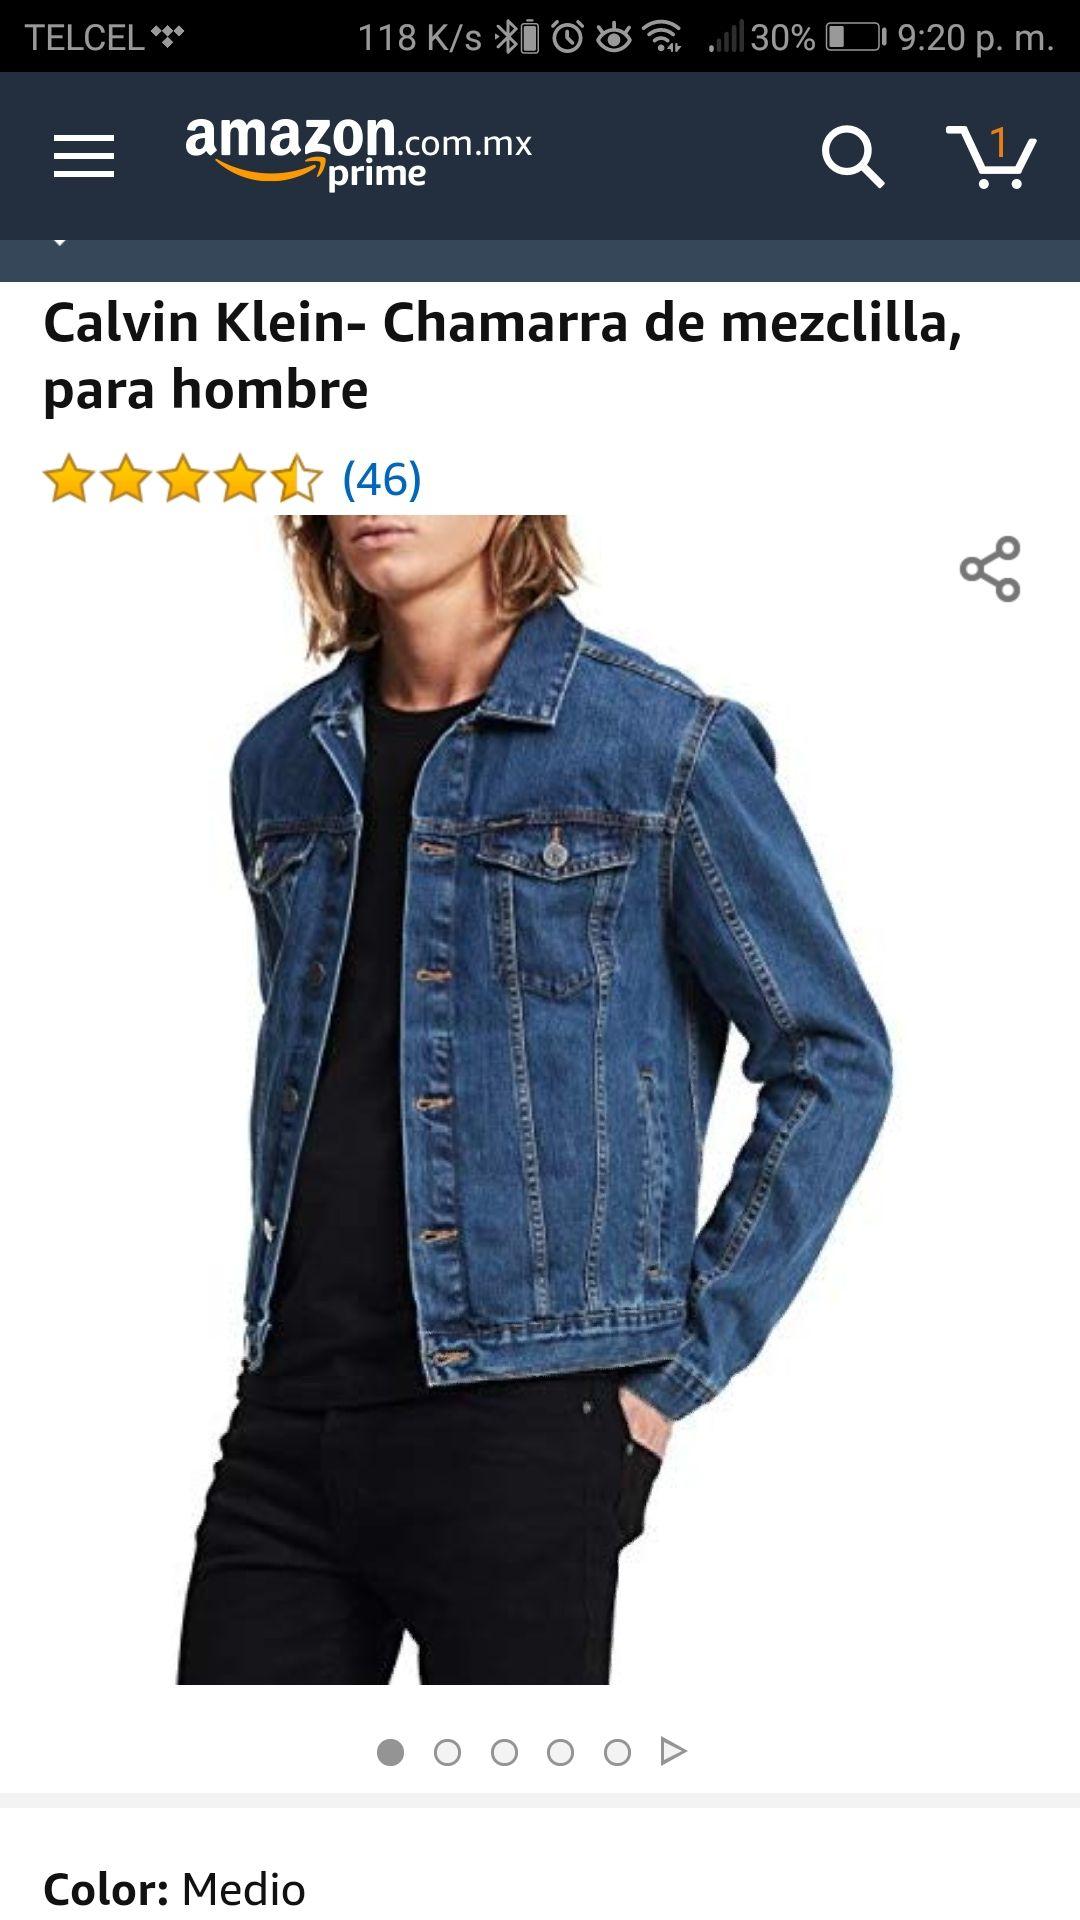 Amazon: Calvin Klein Chamarra de mezclilla para hombre, talla extra chicha y extra grande